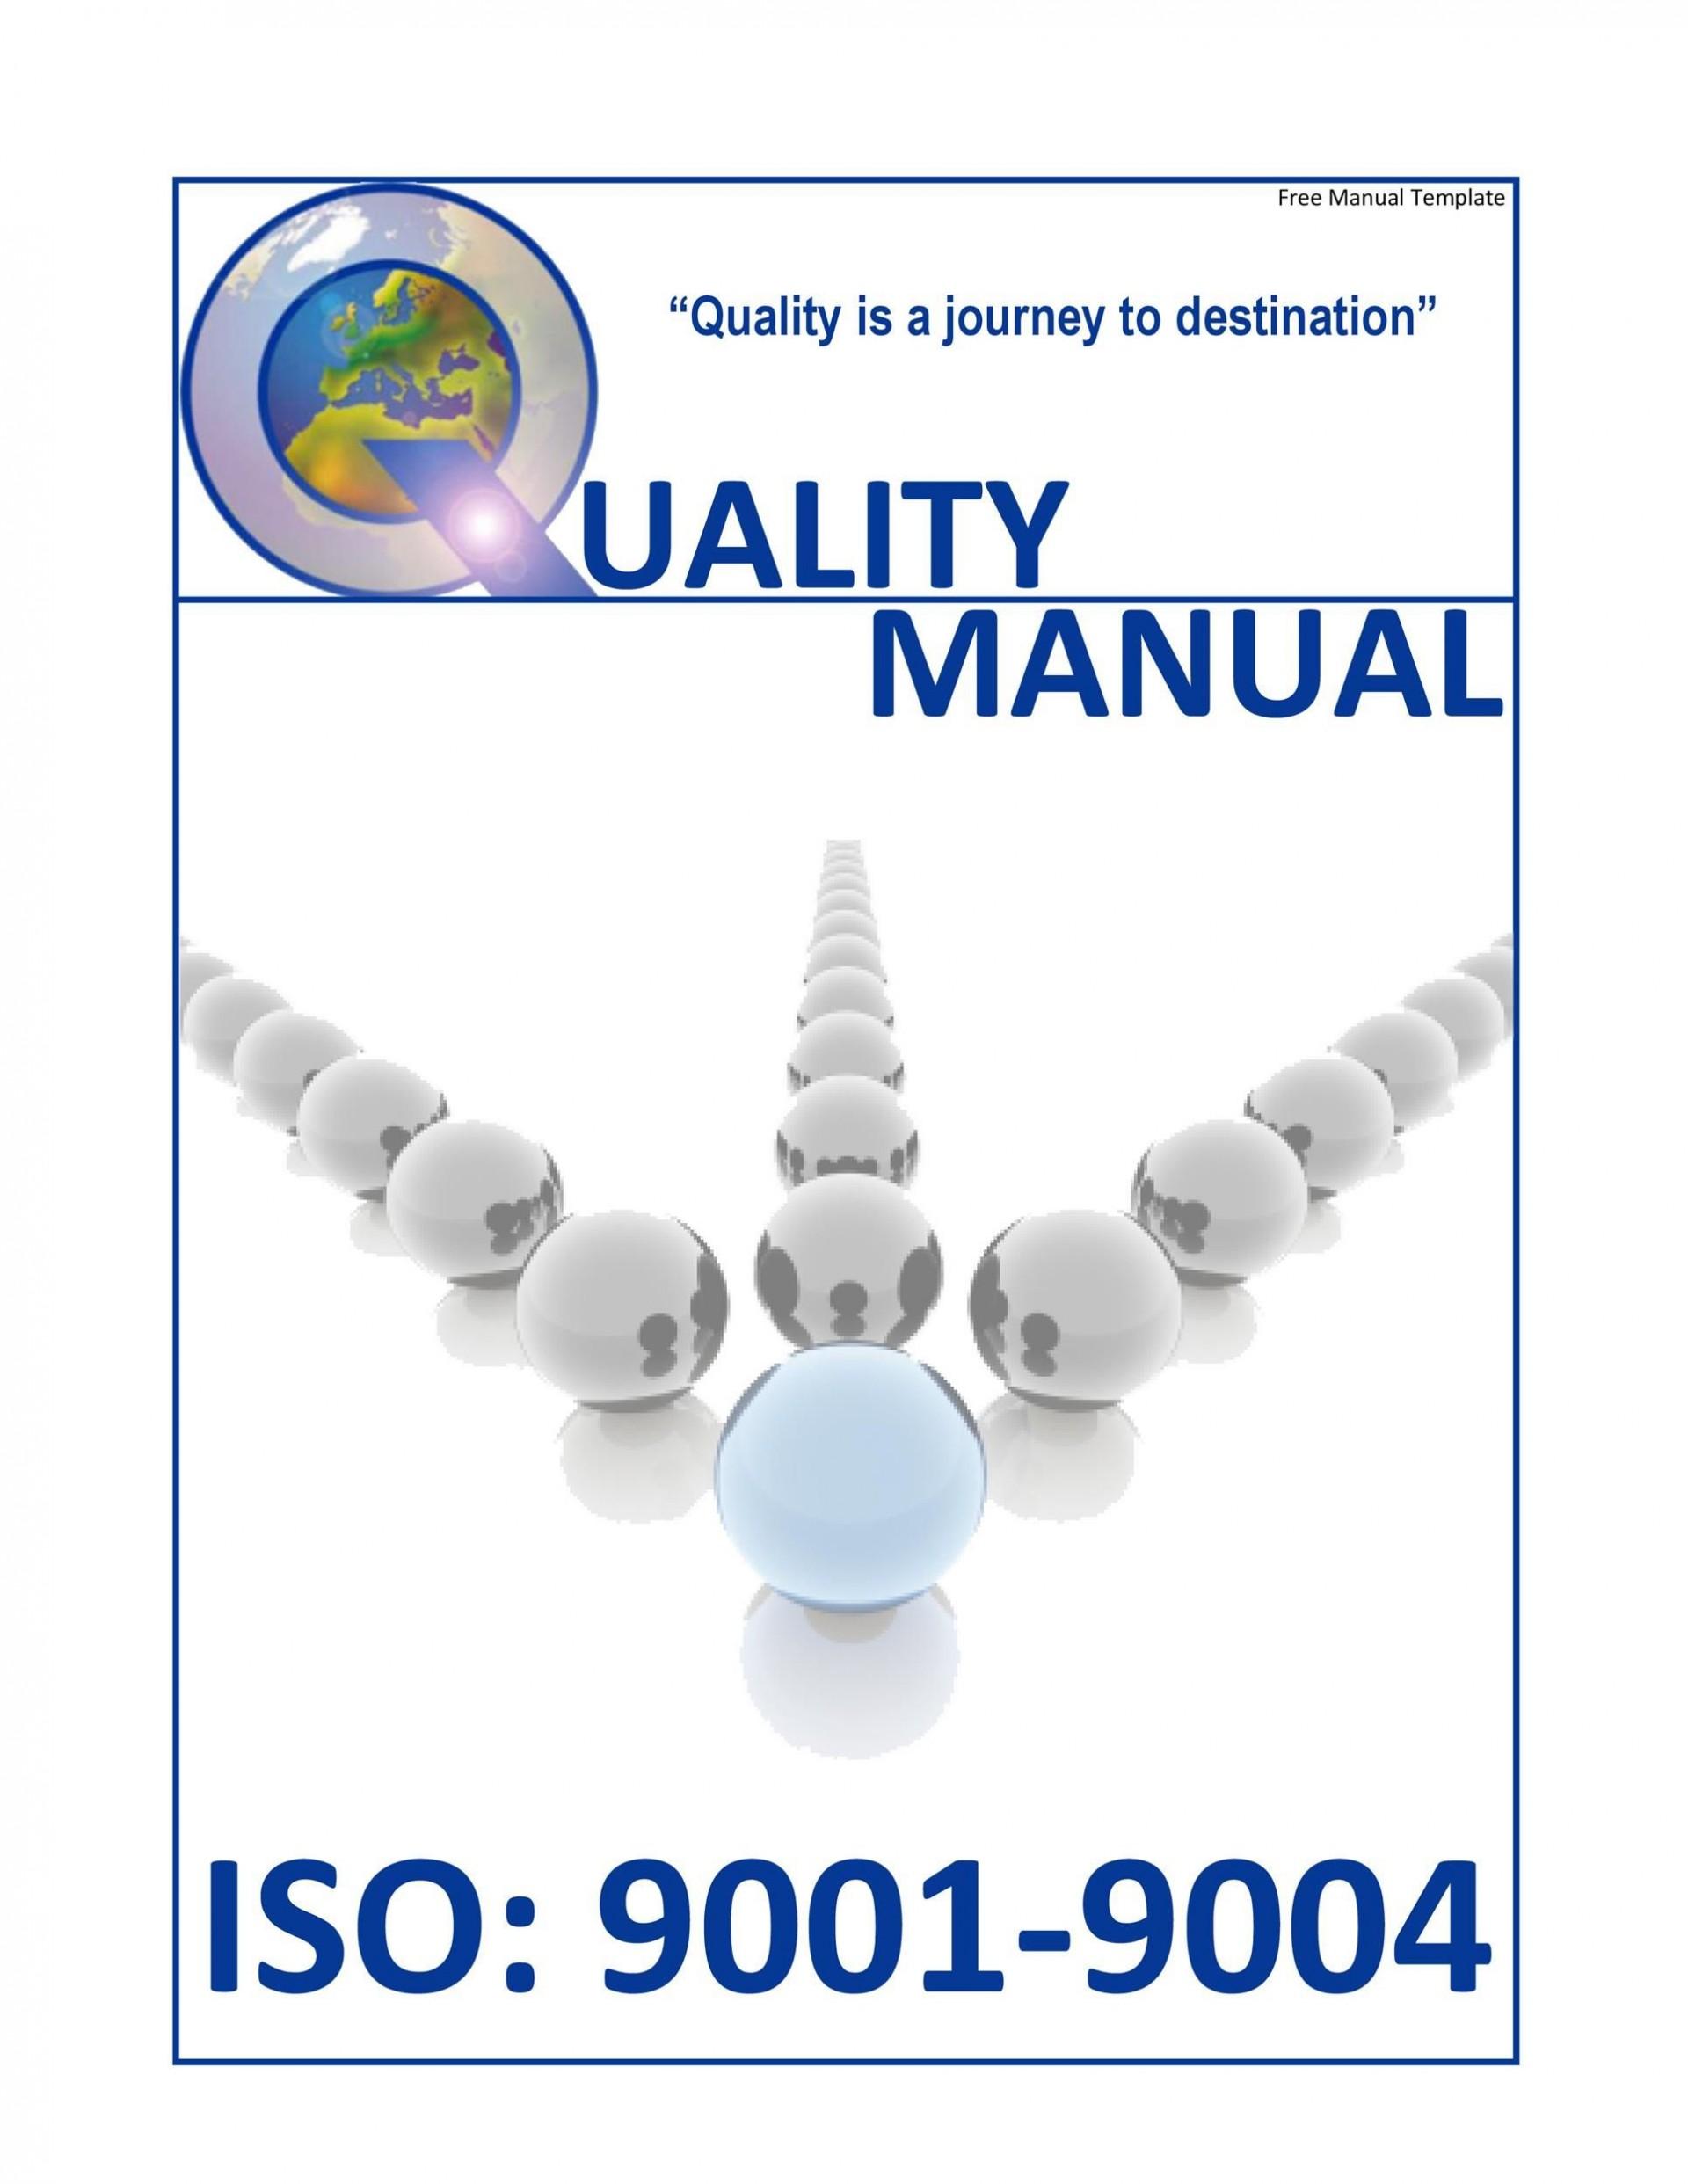 005 Unbelievable Free Employee Handbook Template Word High Resolution  Sample In Training Manual1920